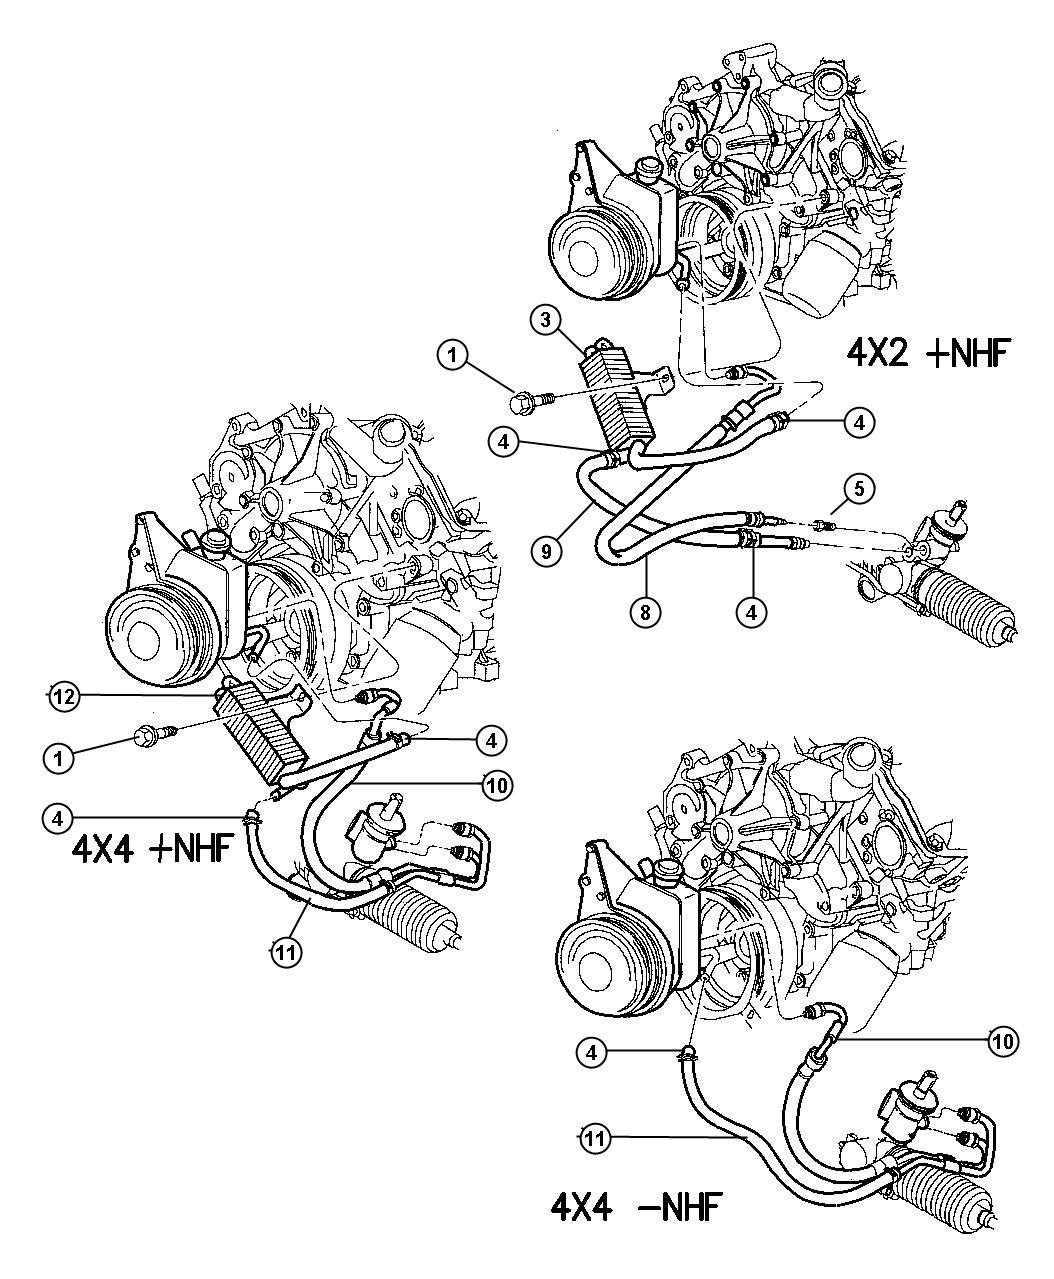 1996 Ford Explorer Awd Drivetrain Diagram Automotive Wiring Jeep Driveline Imageresizertool Com 1997 Parts 2003